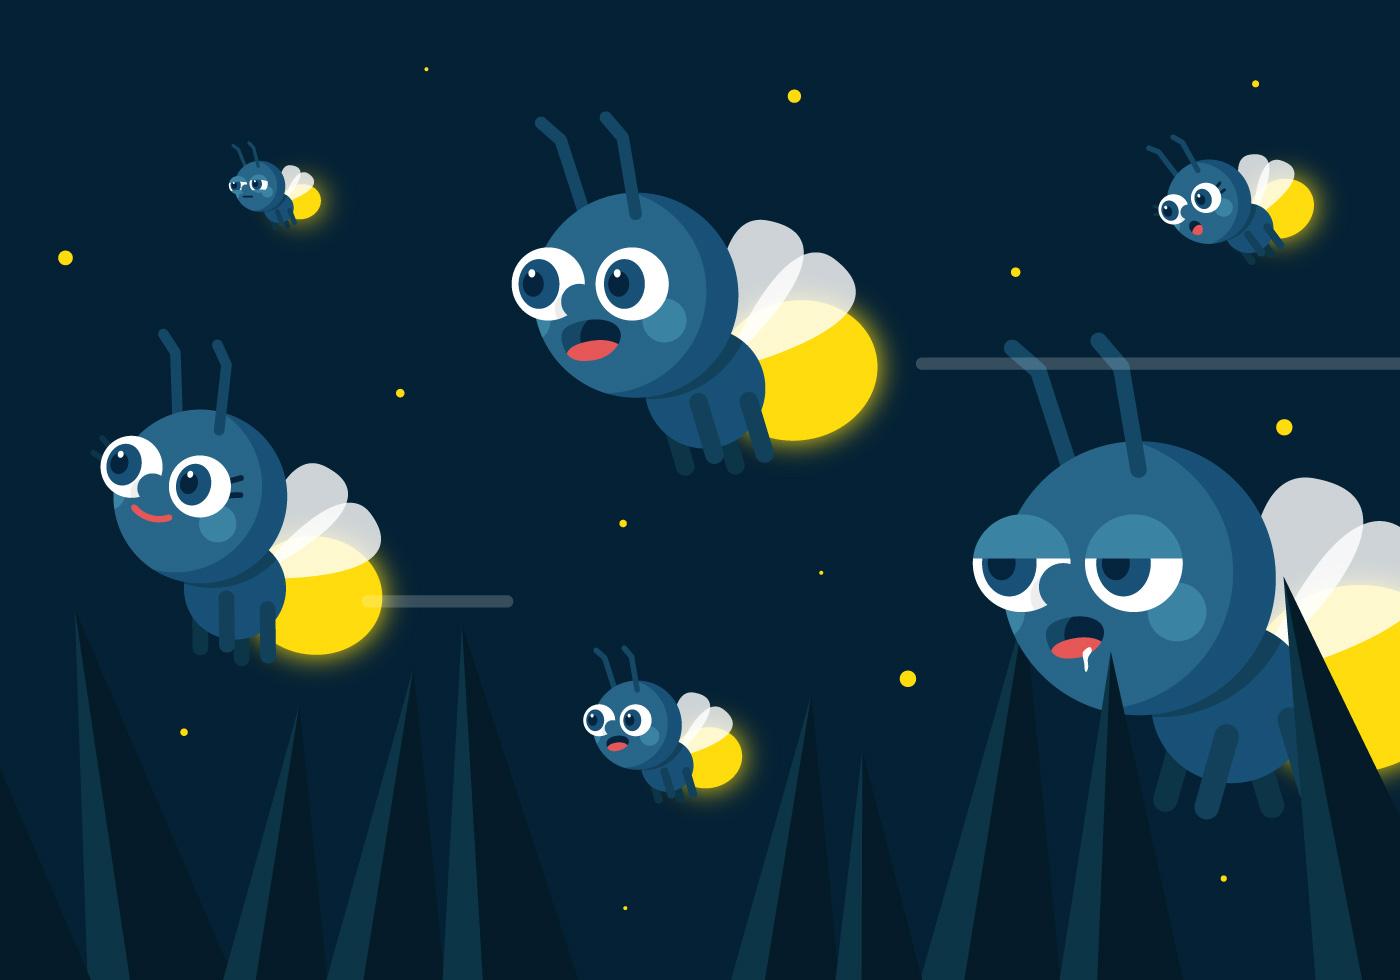 Sticker Wallpaper Vector Fireflies Download Free Vector Art Stock